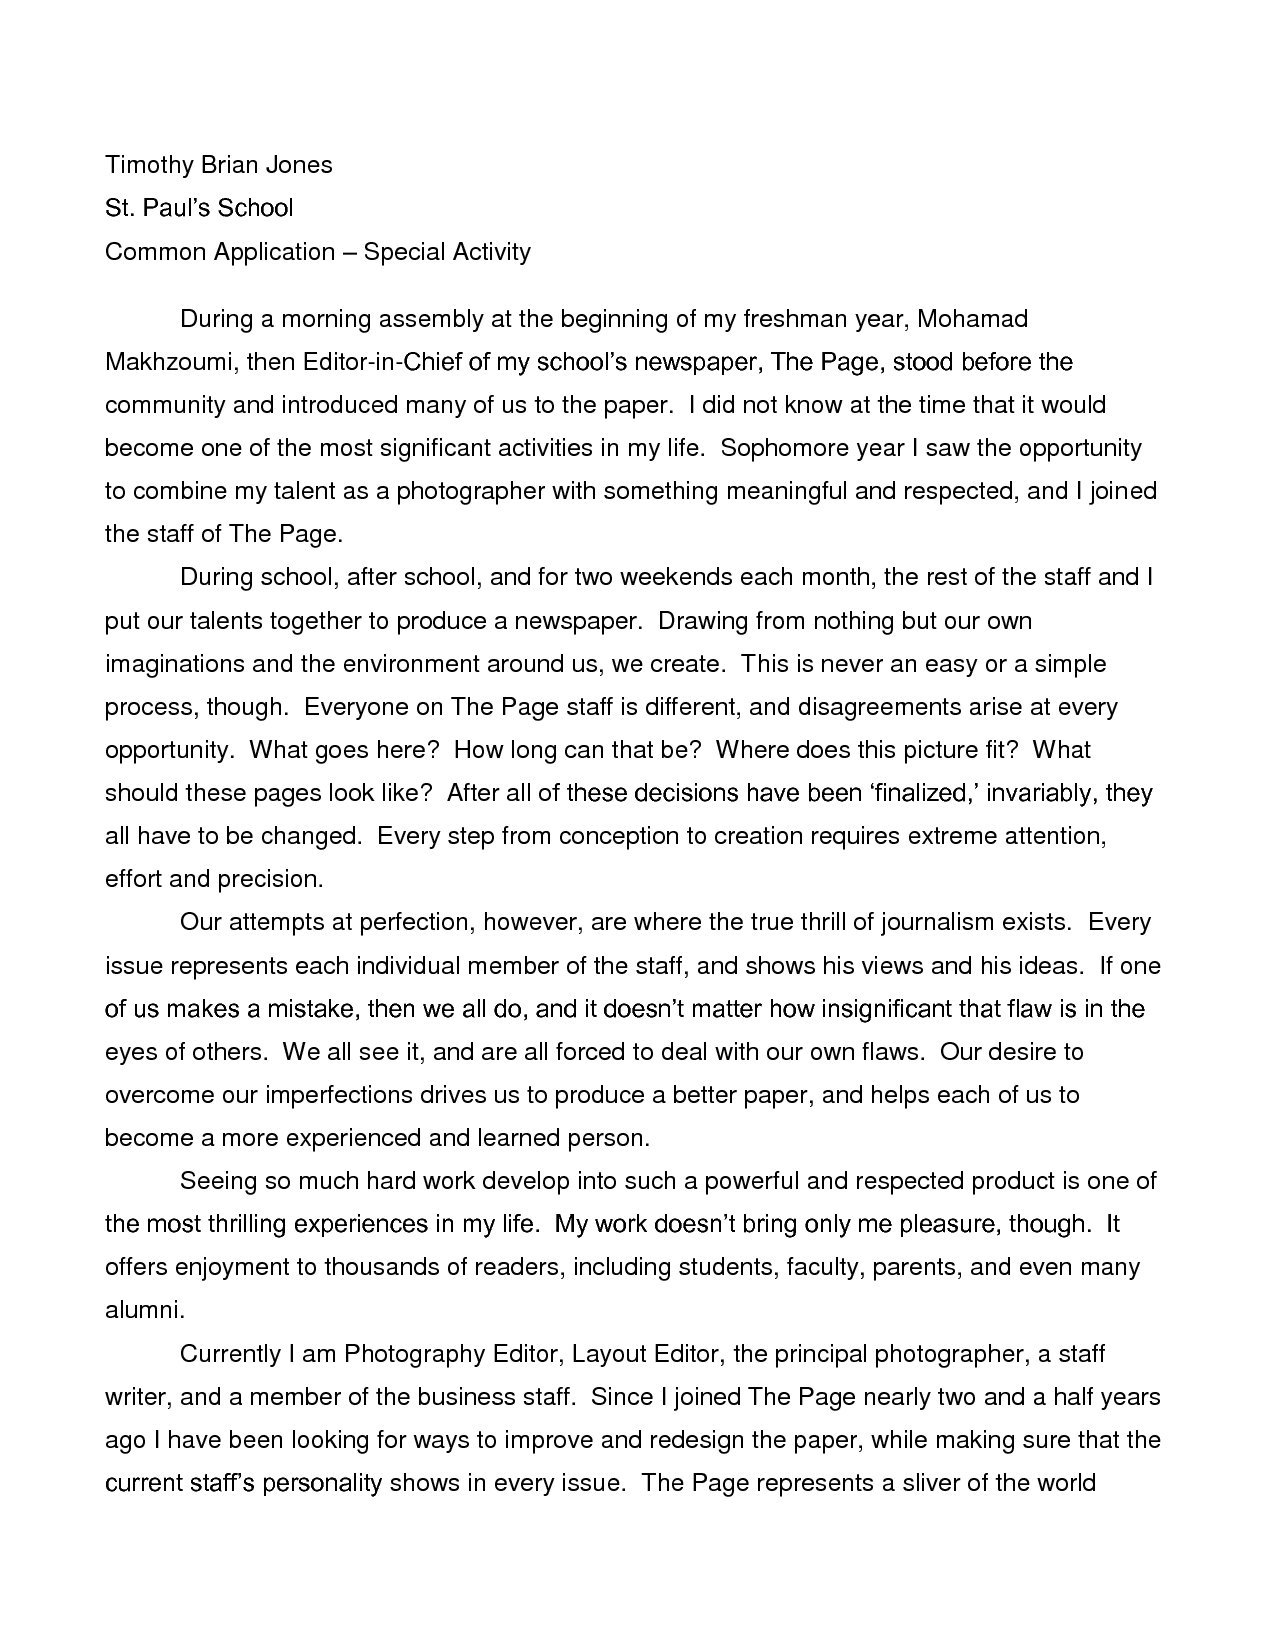 025 Paragraph Essay Example High School Free Samples Graduate Essays Of Persuasive L Sensational 5 Pdf Template For Full